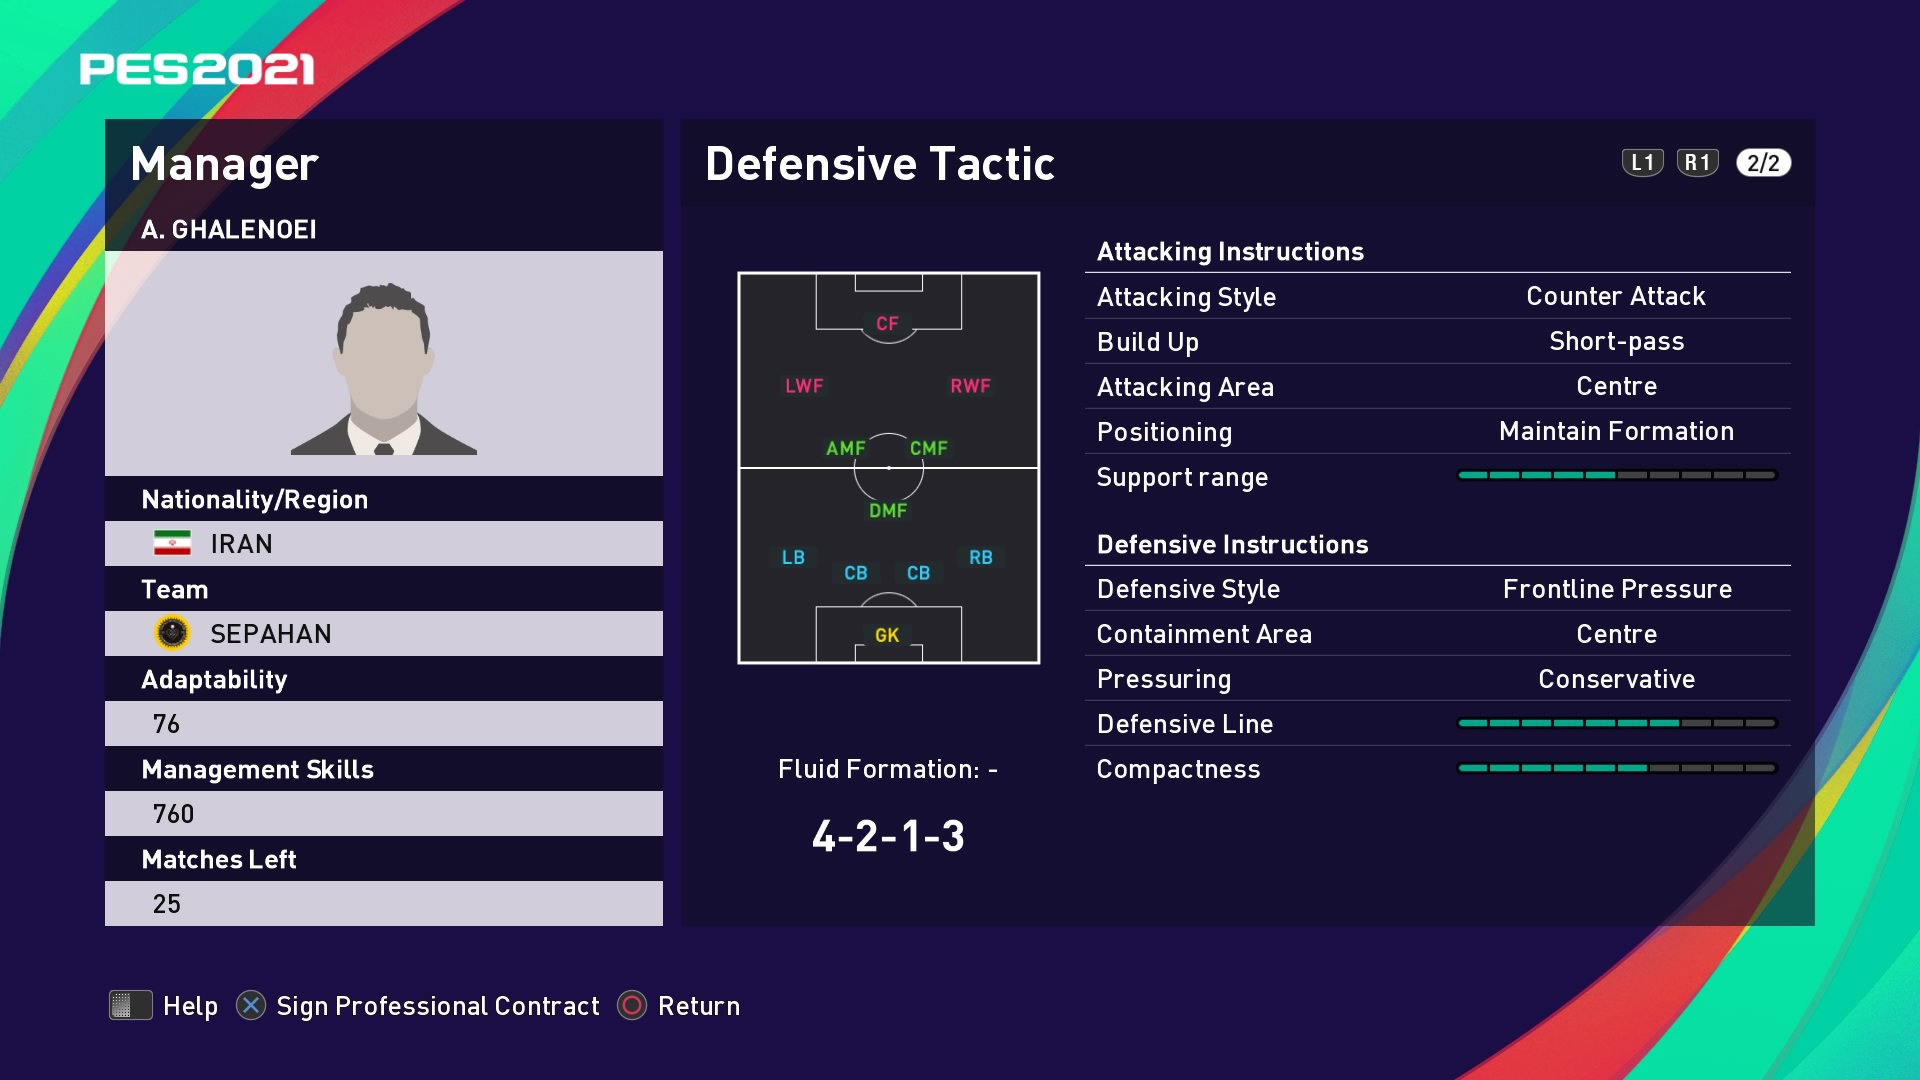 A. Ghalenoei (Amir Ghalenoei) Defensive Tactic in PES 2021 myClub